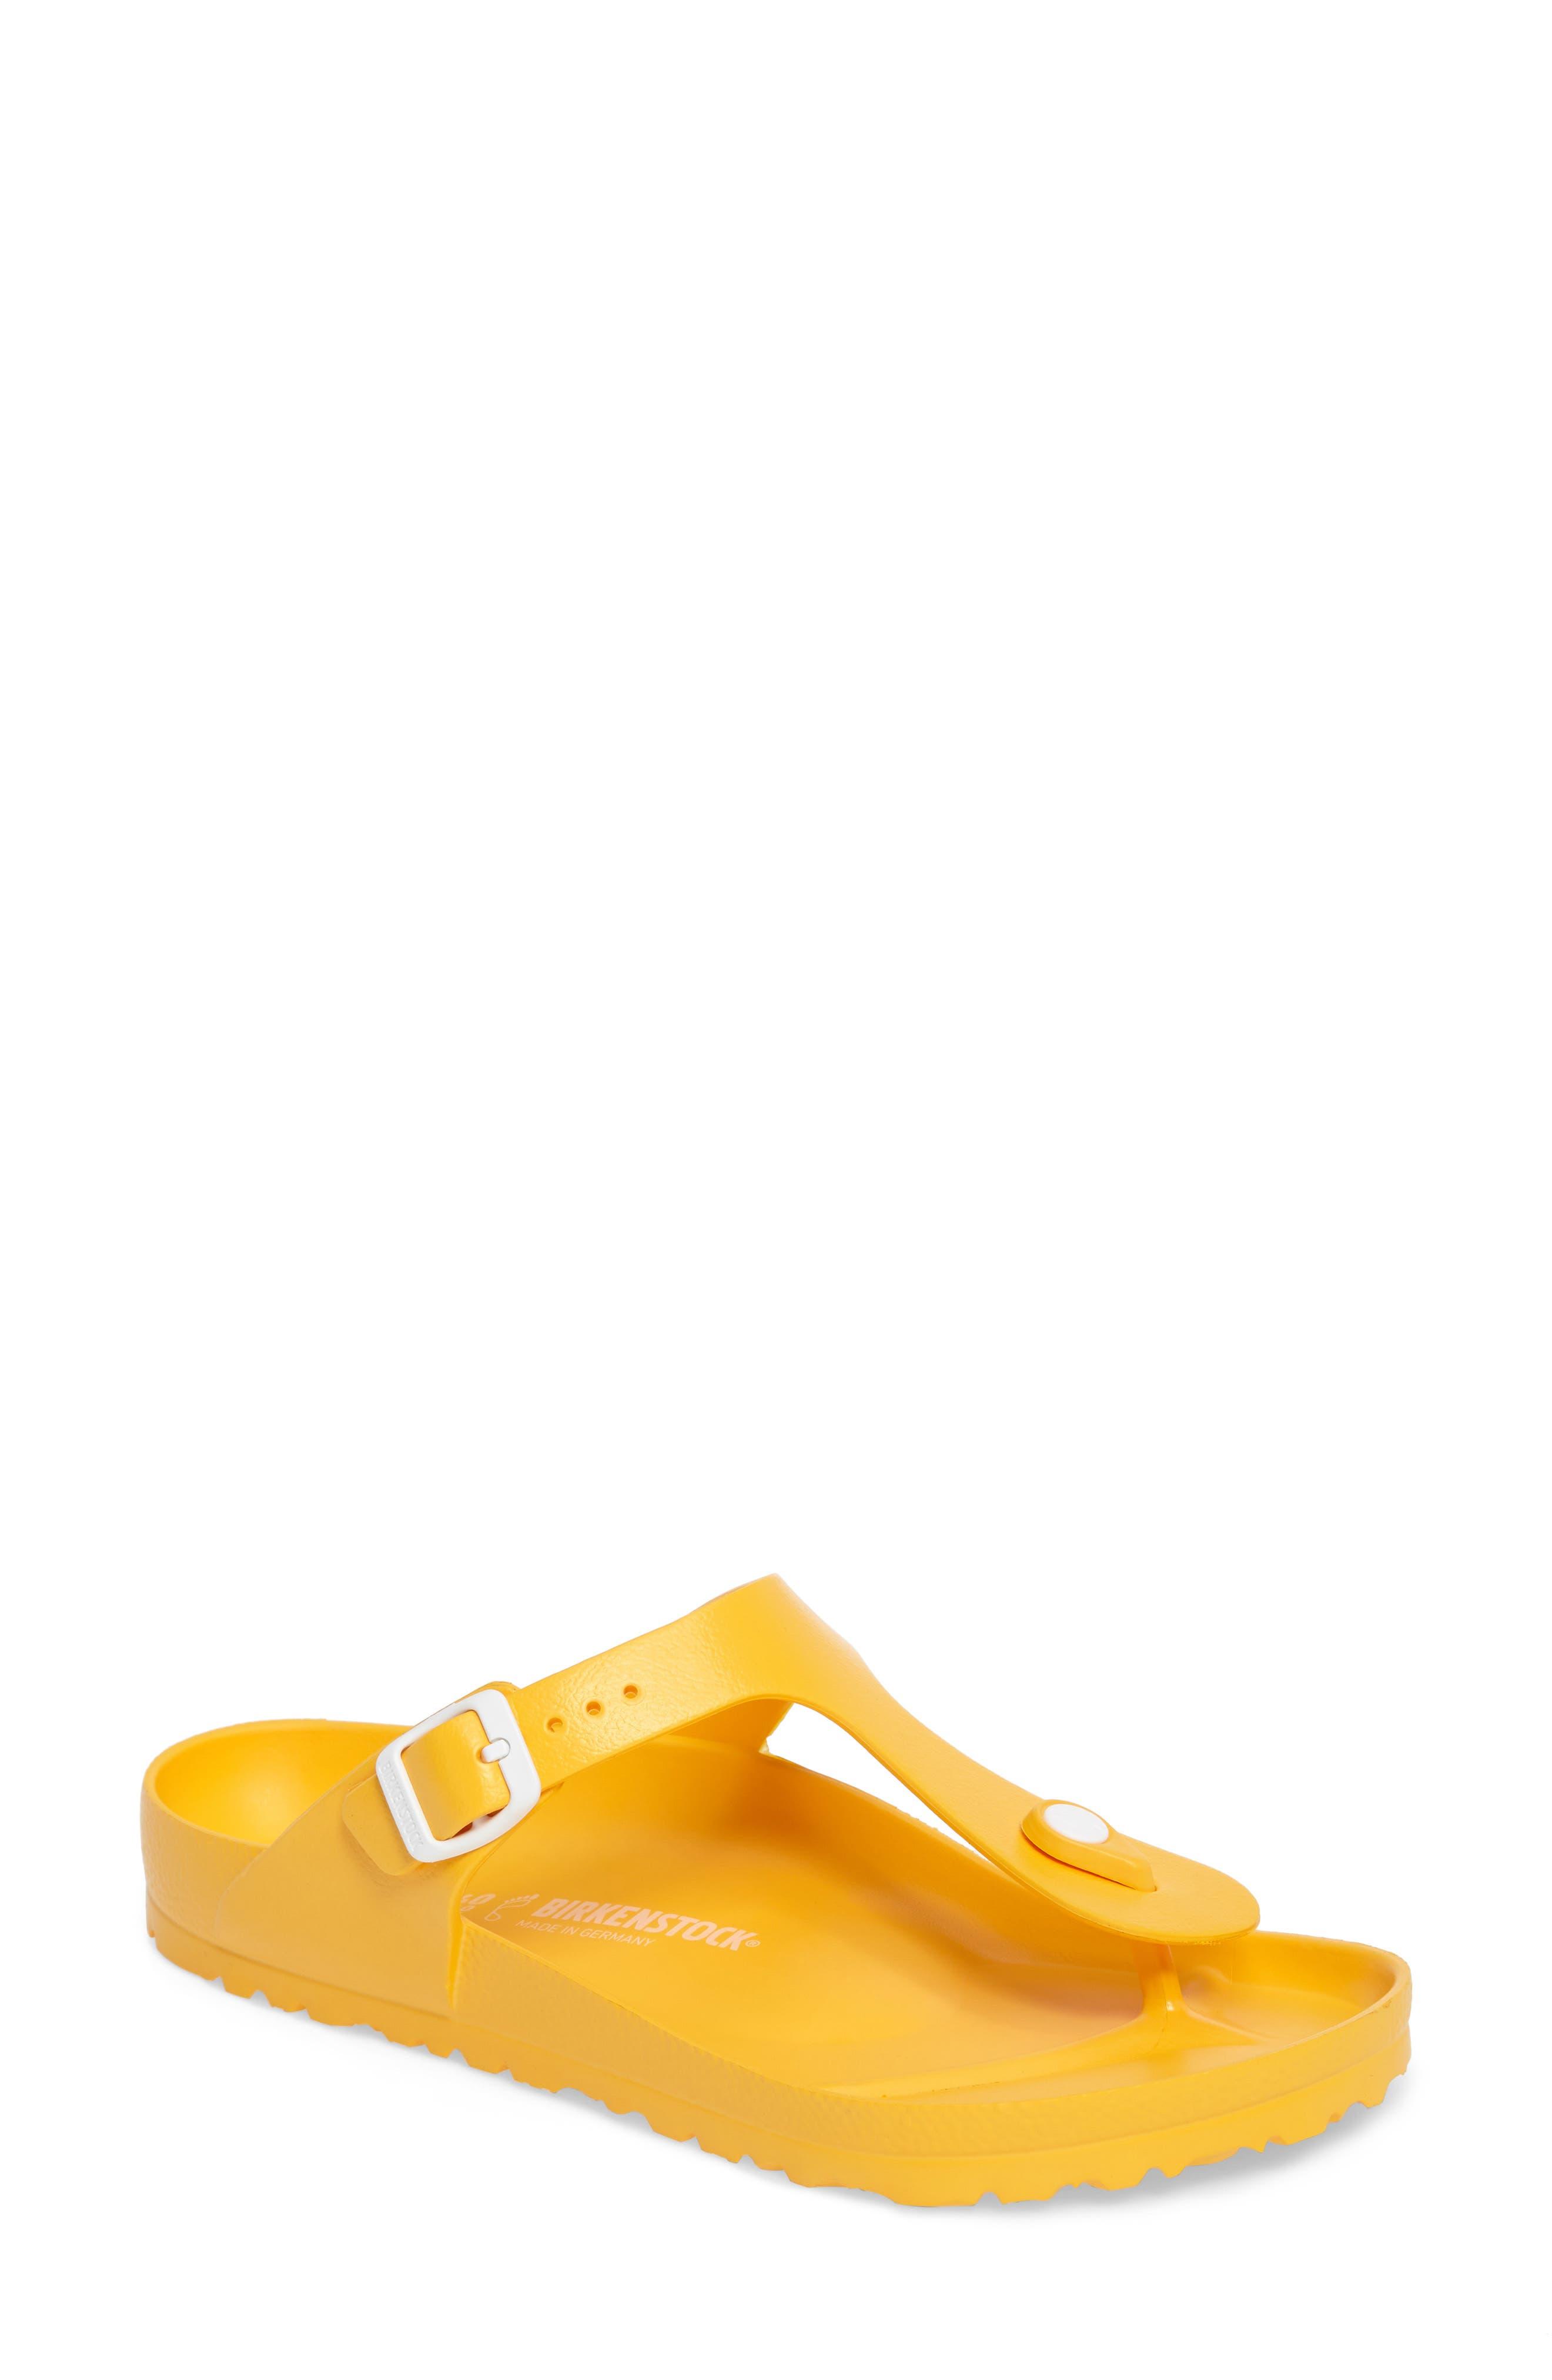 Main Image - Birkenstock Gizeh EVA Flip Flop (Women)